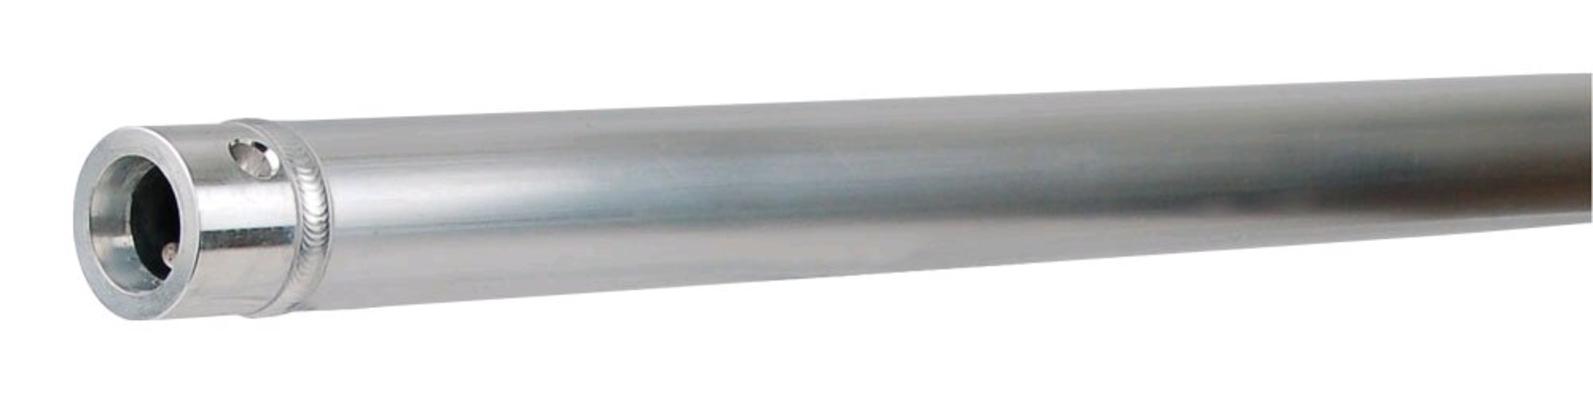 Contest UNO-200 – Tube alu Dia. 50mm longueur 200cm